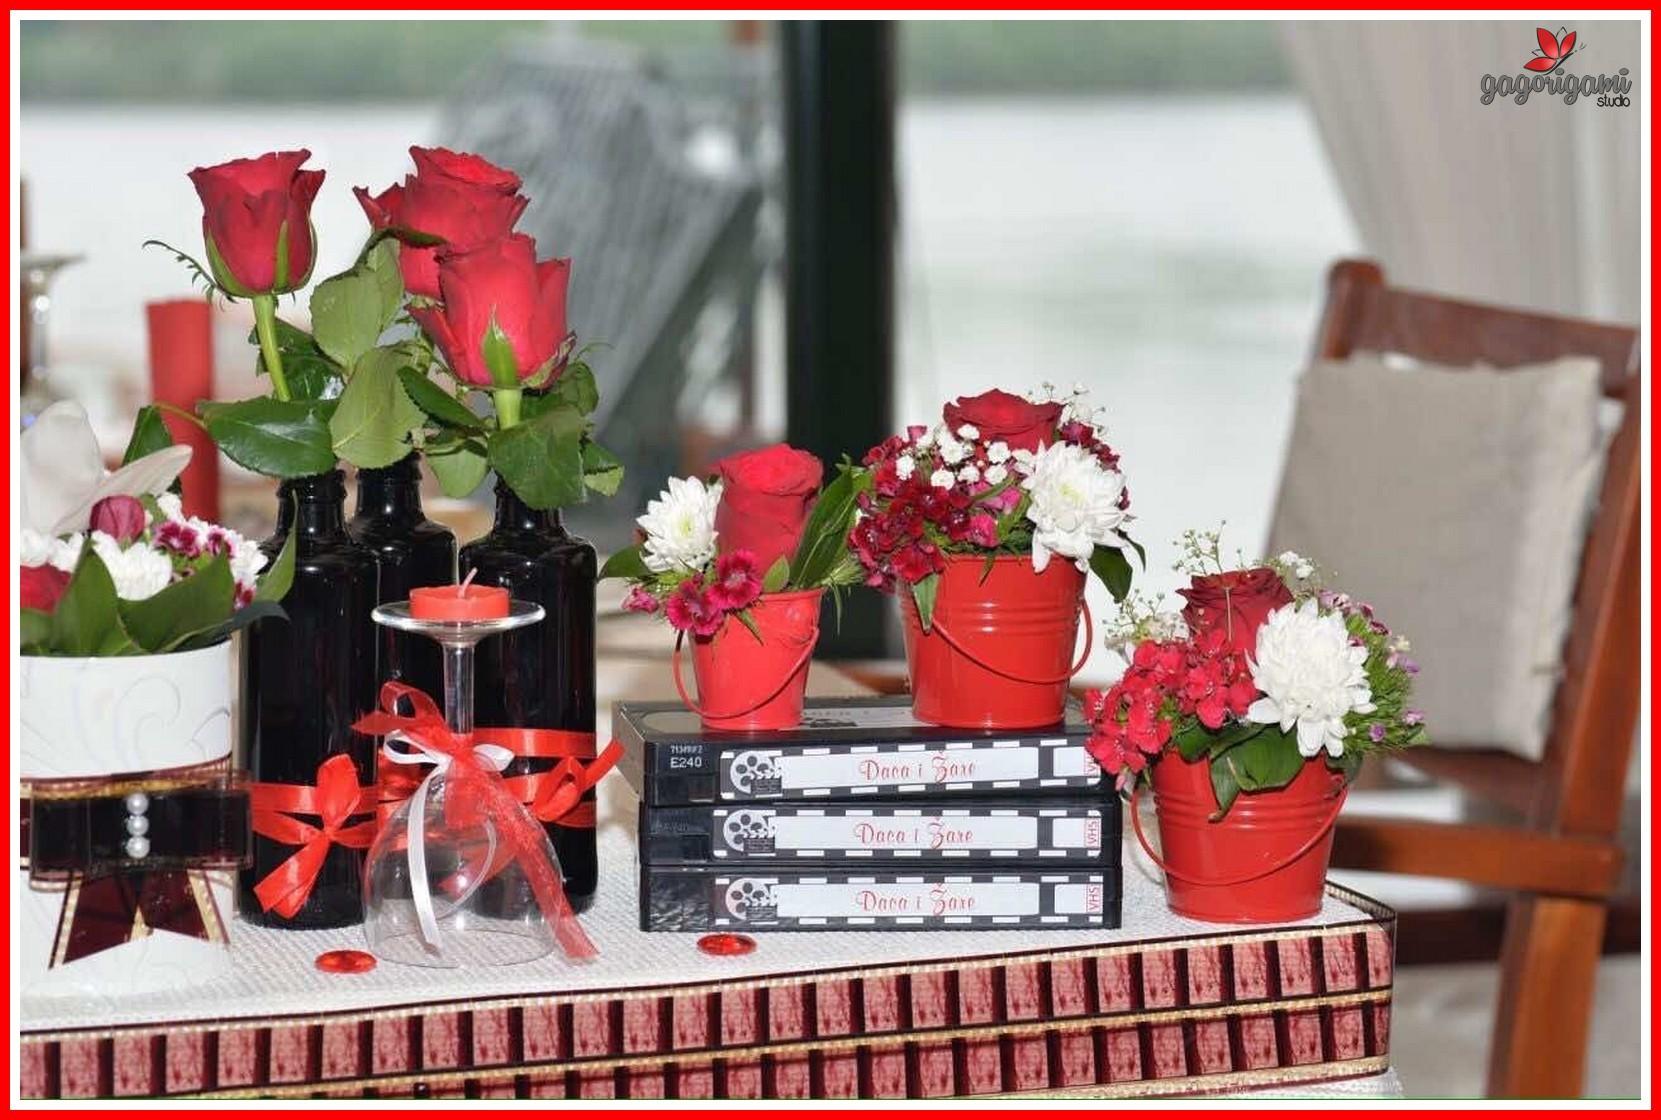 svadbaivencanje-gagorigami-dekoracija